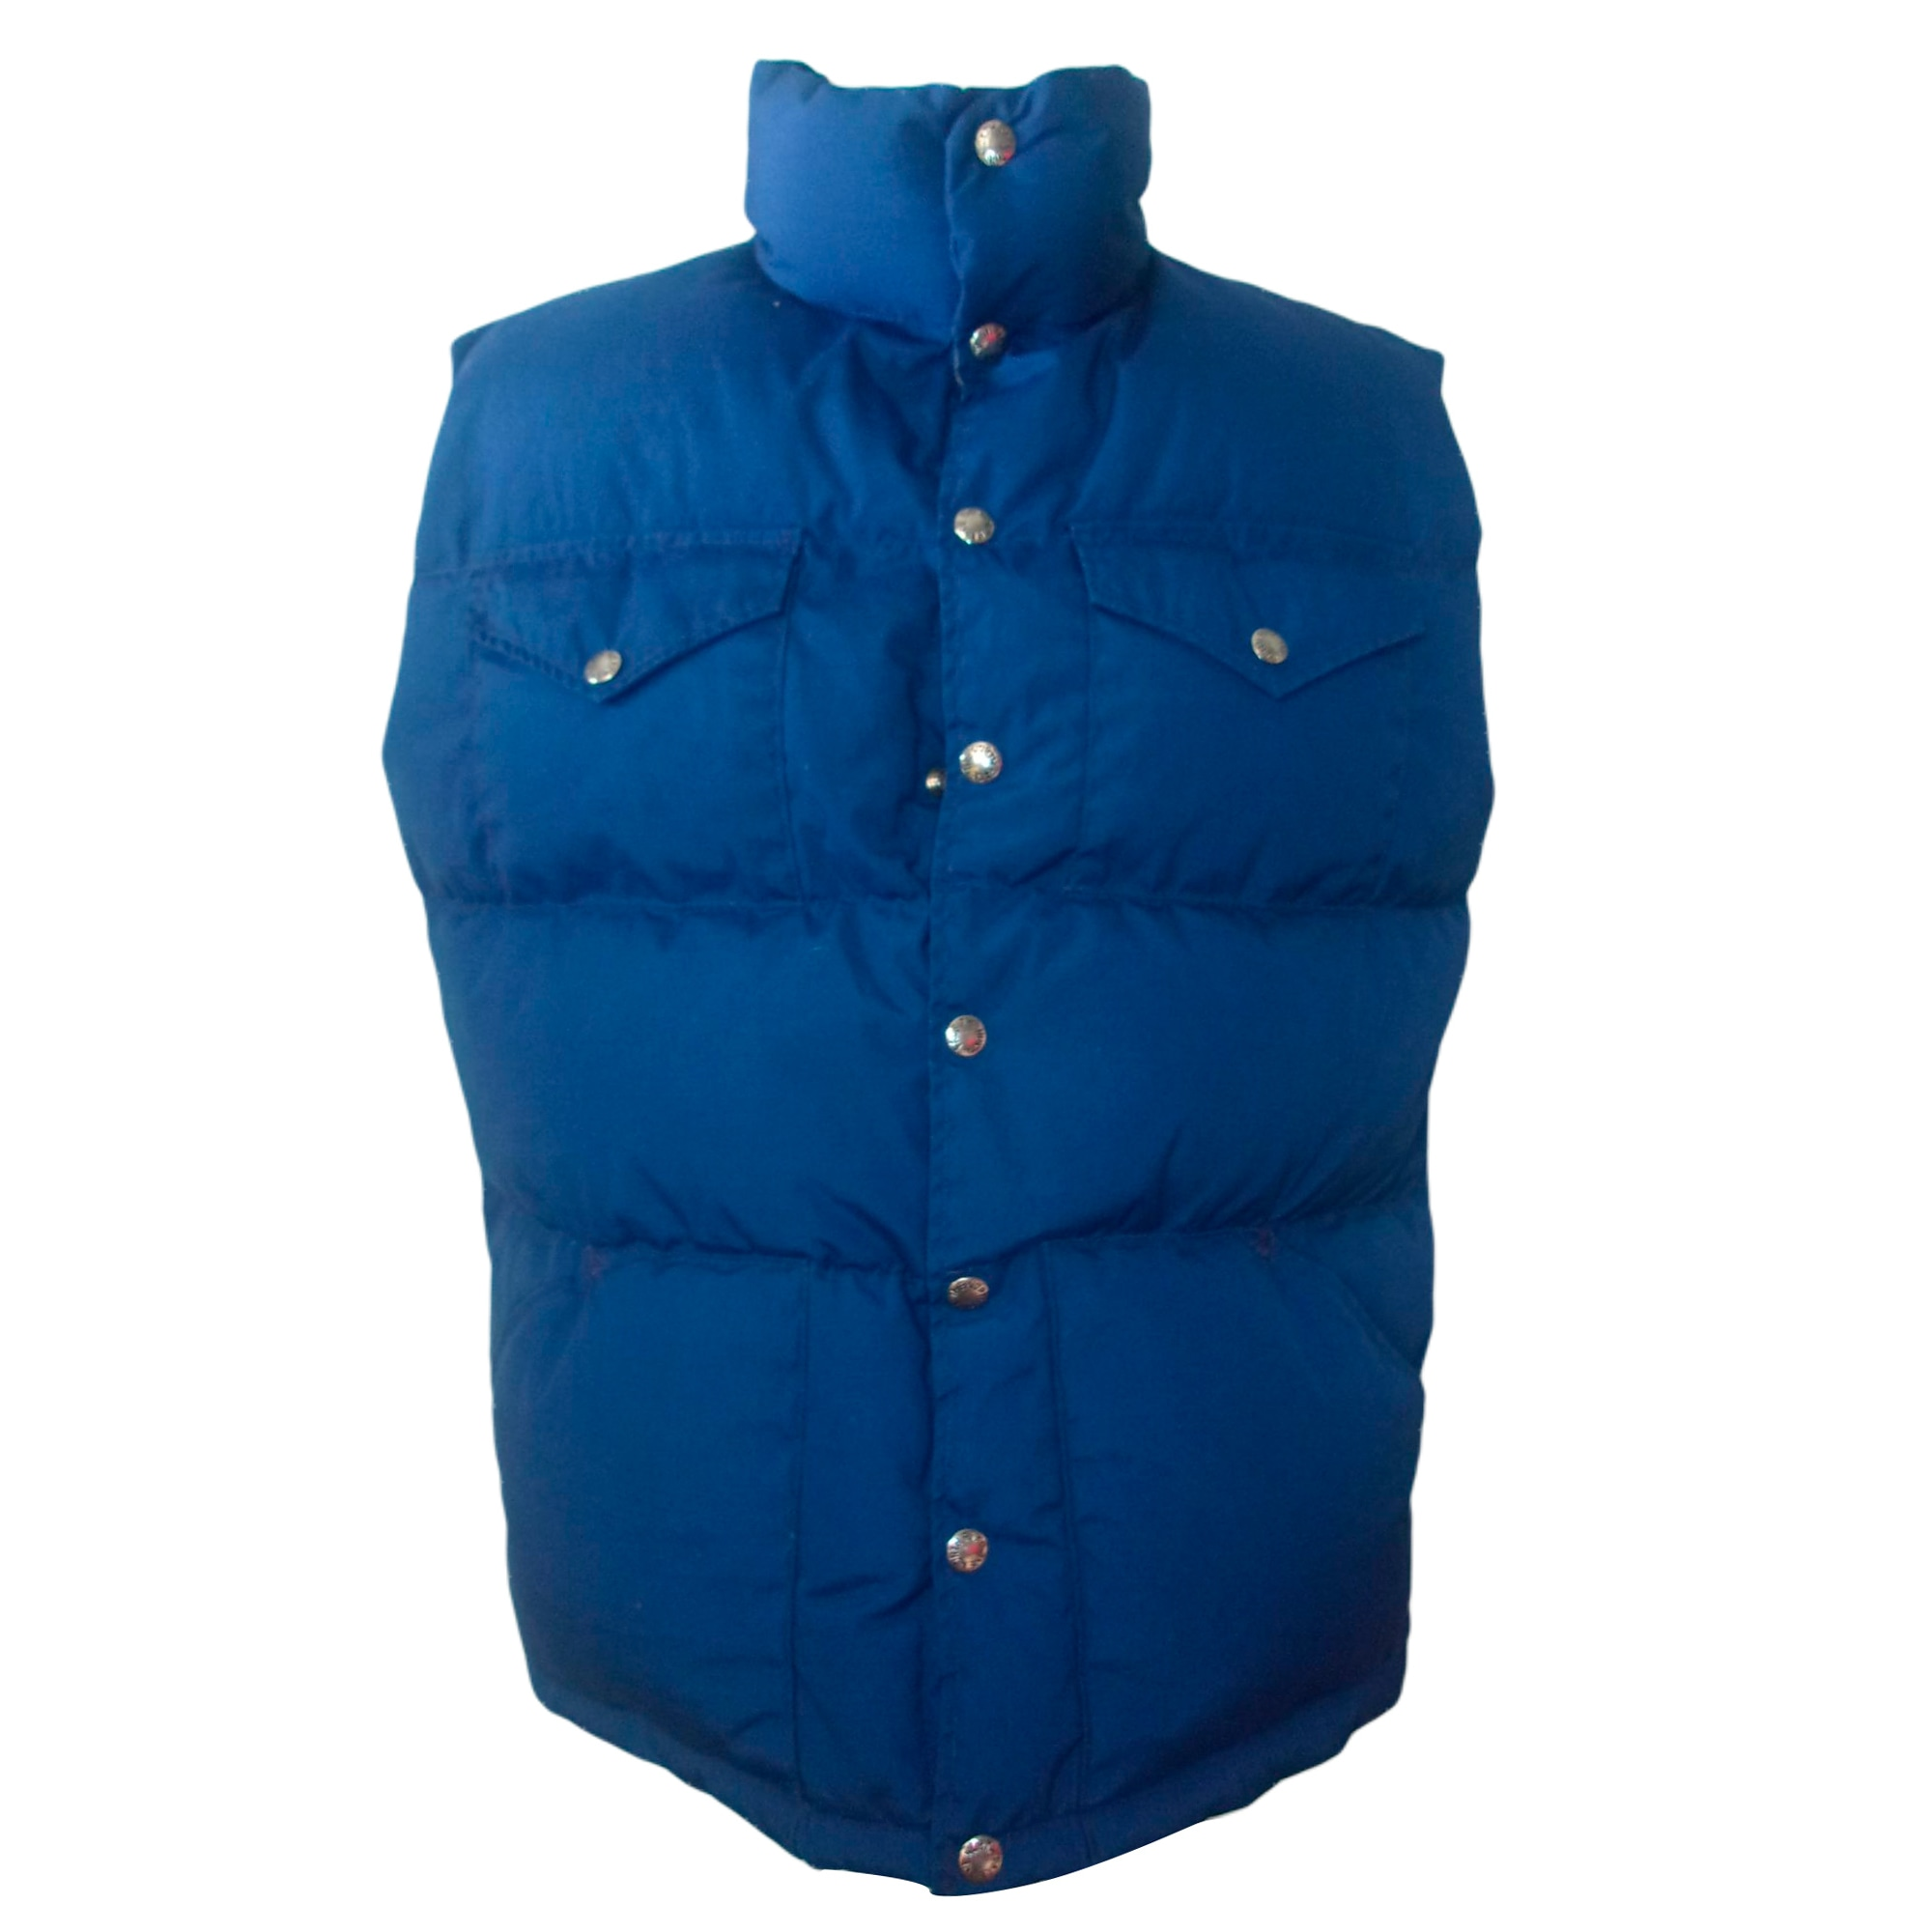 Doudoune THE NORTH FACE Bleu, bleu marine, bleu turquoise